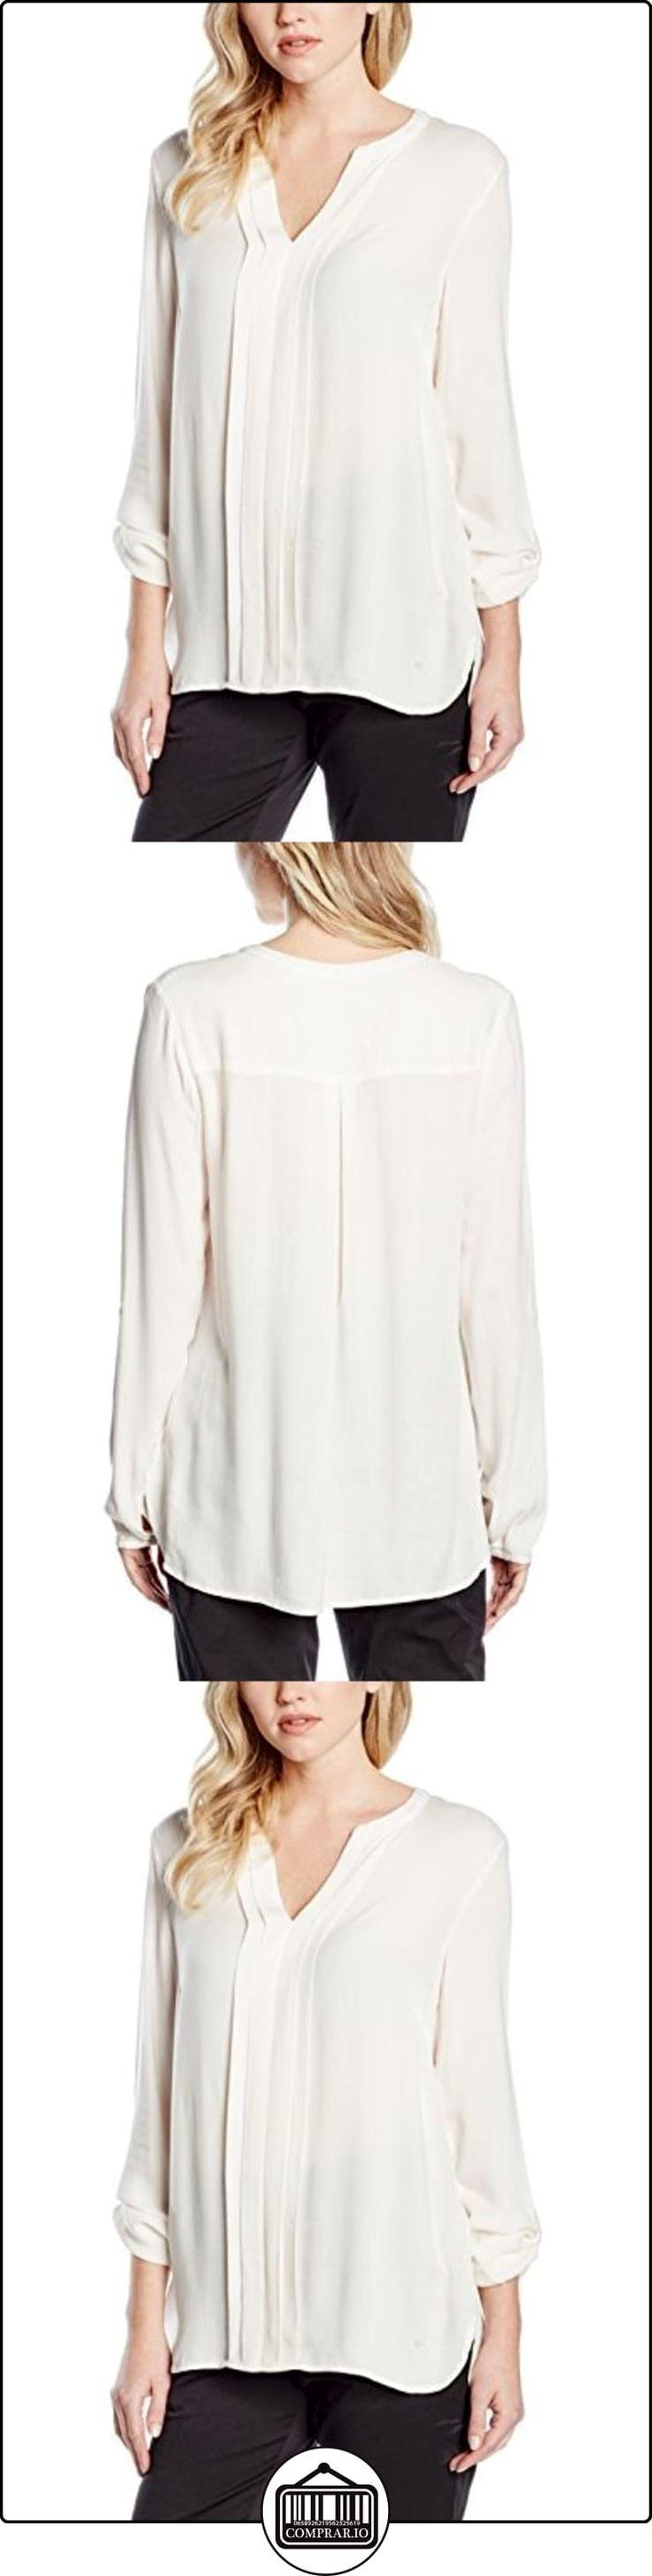 Olsen 12001345, Blusa para Mujer, Beige (Pale White 10017ST), 44  ✿ Blusas y camisas ✿